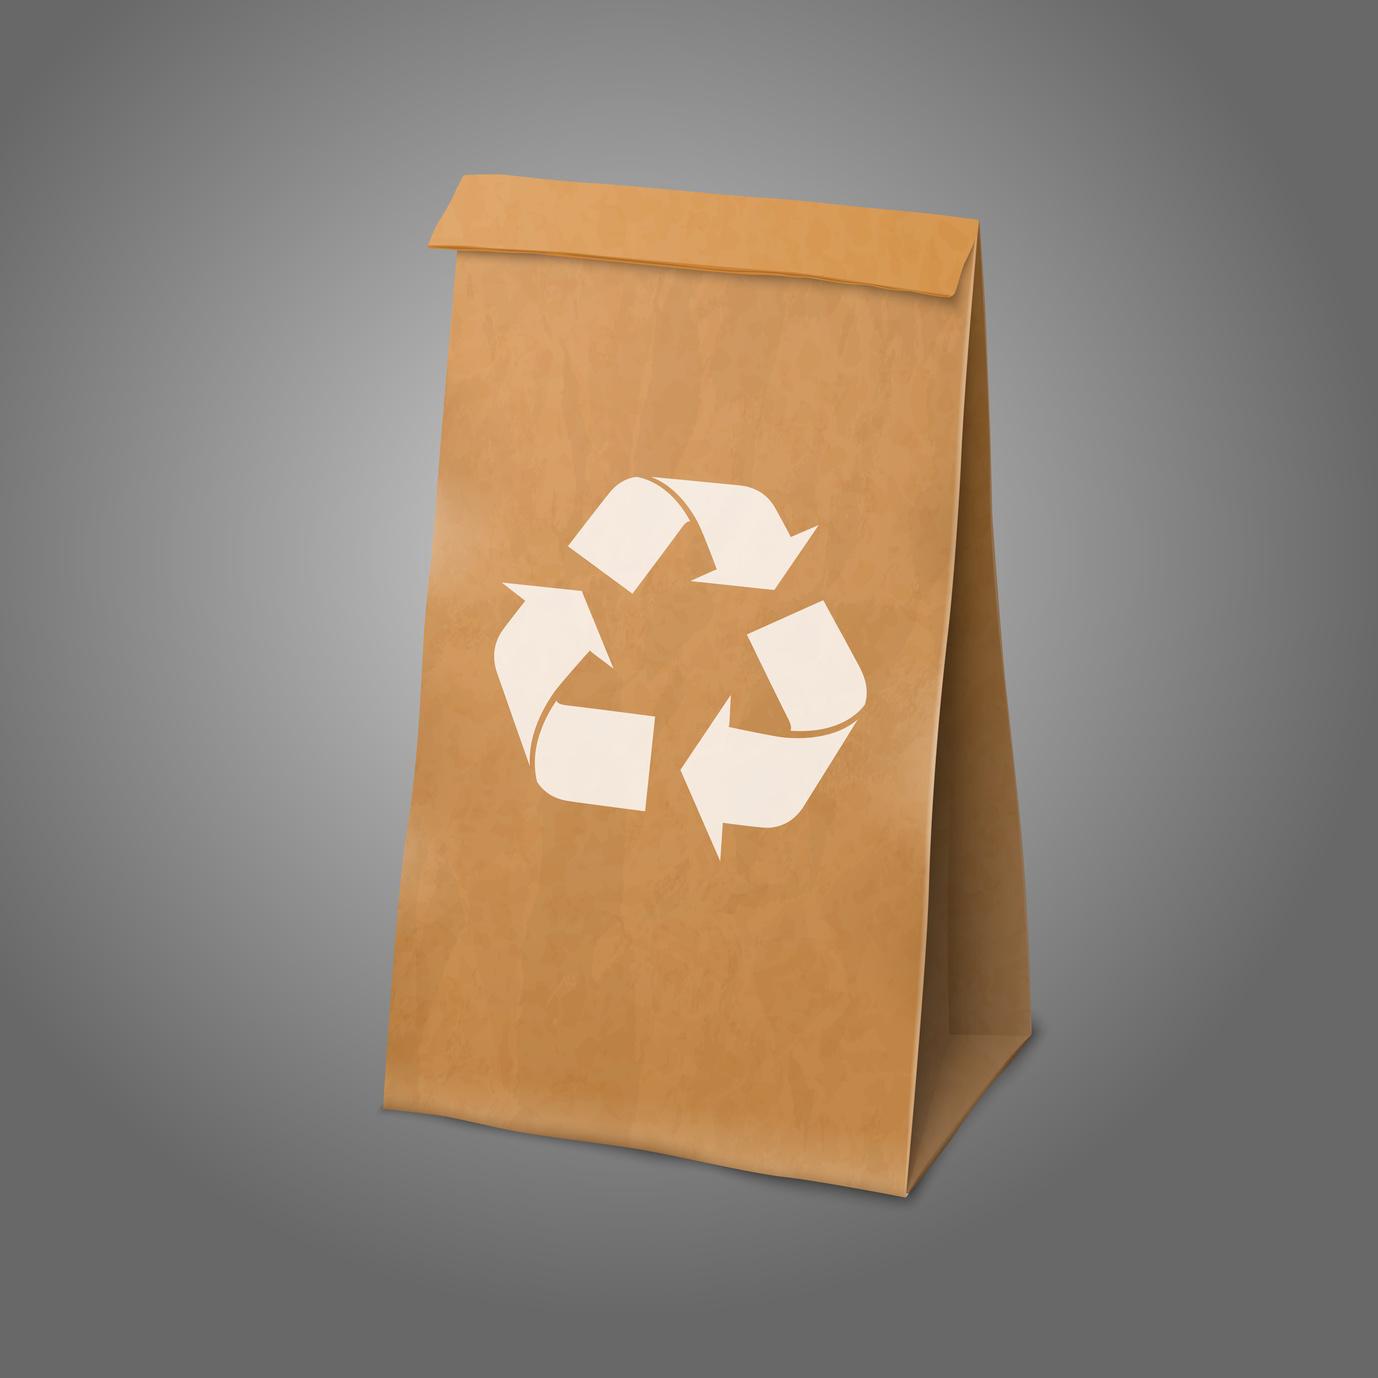 packaging, sacchetto di carta